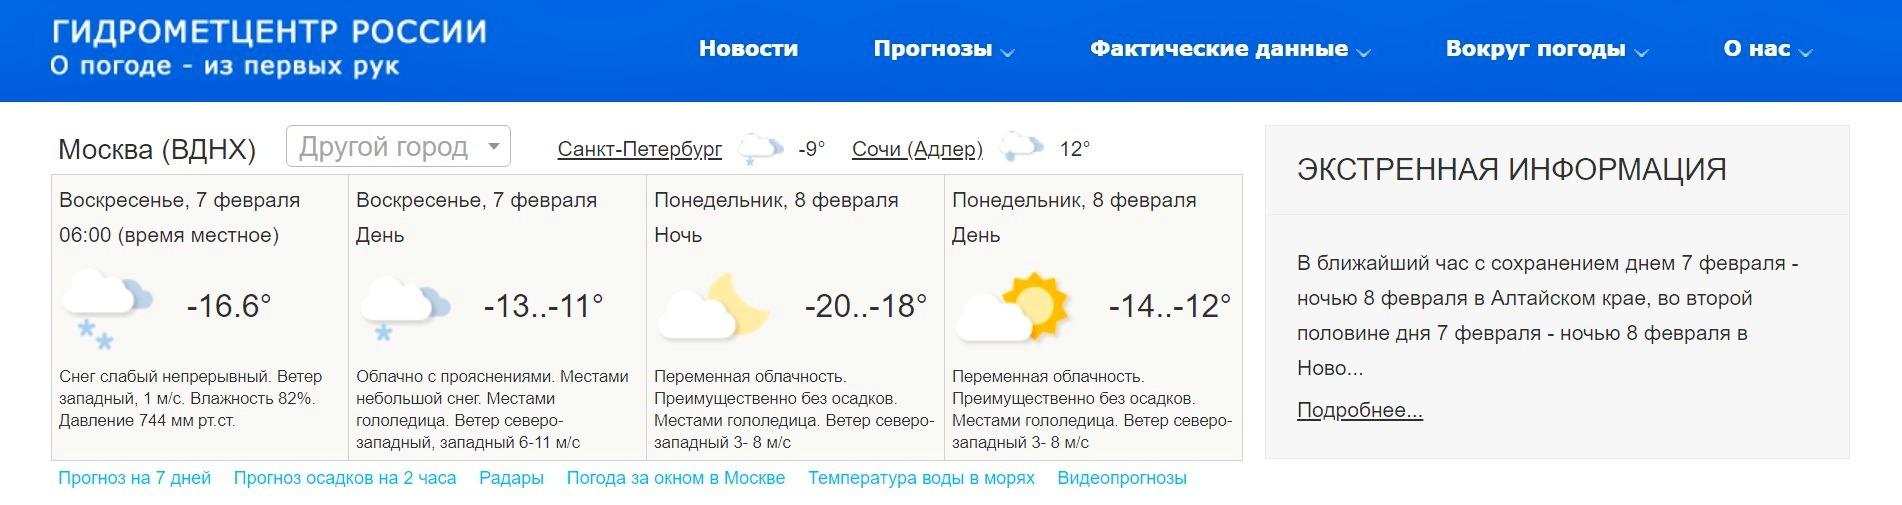 метеоинфо гидромецентр России